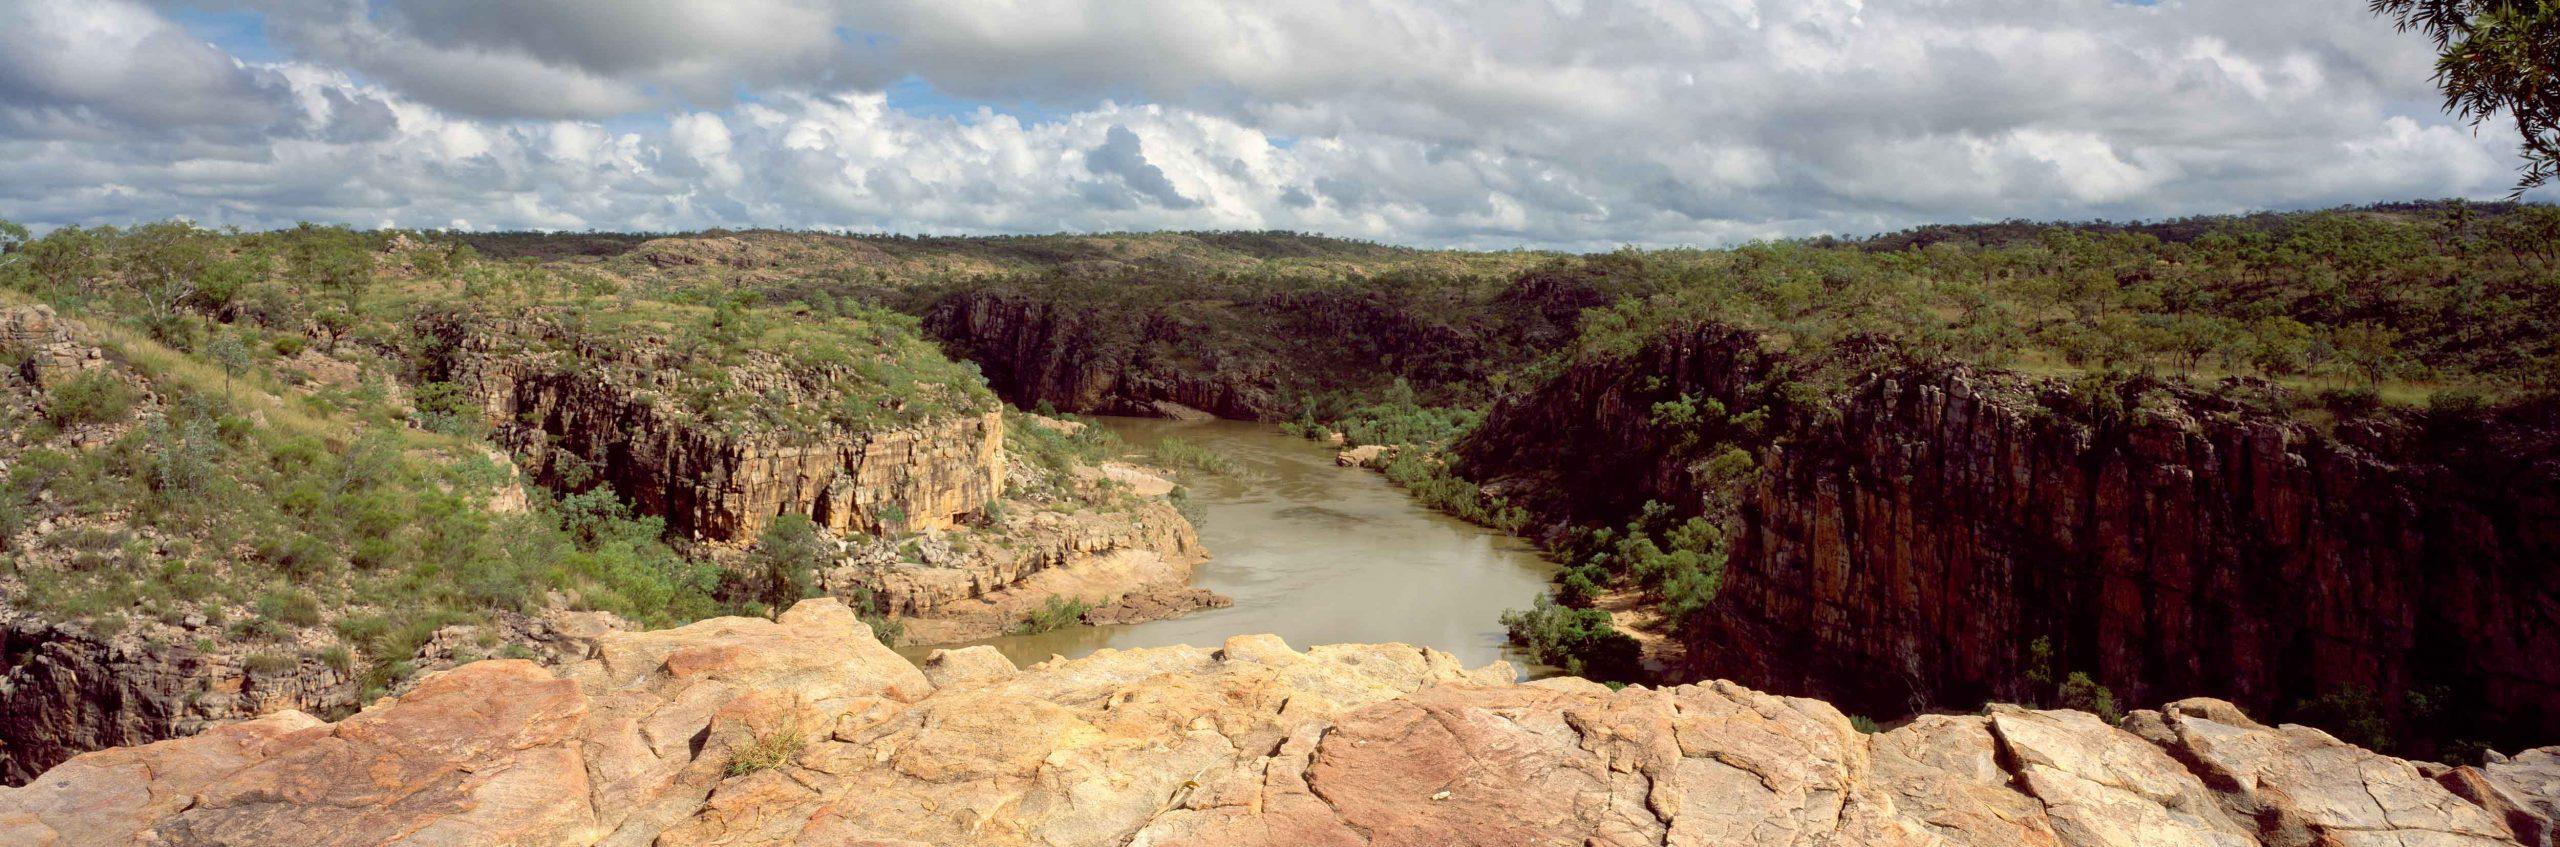 Katherine George, Nitmiluk National Park, Northern Territory